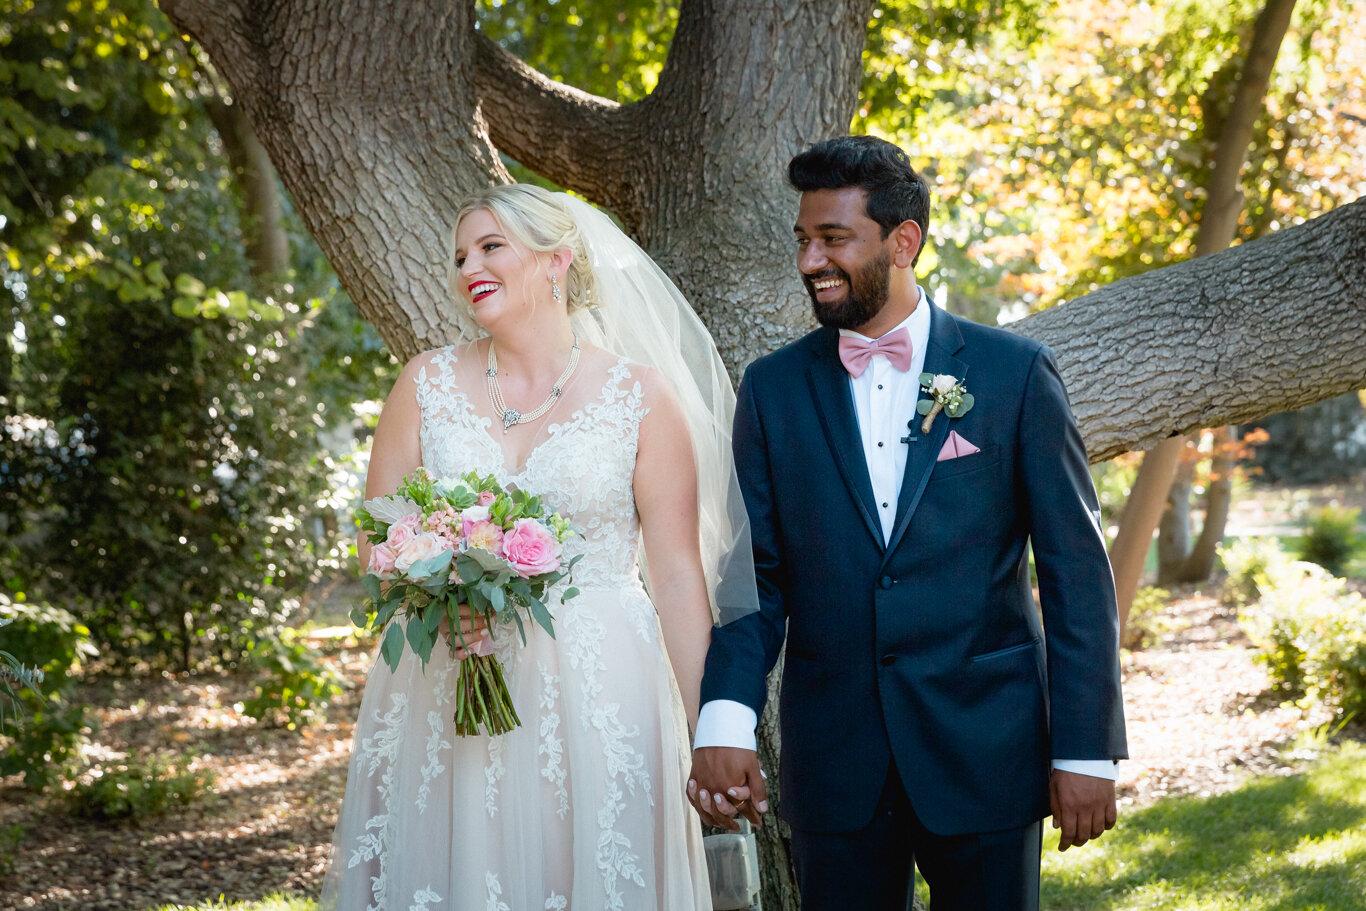 2019.08.24_Emily-Ashir-Wedding-at-the-Maples-5807.jpg